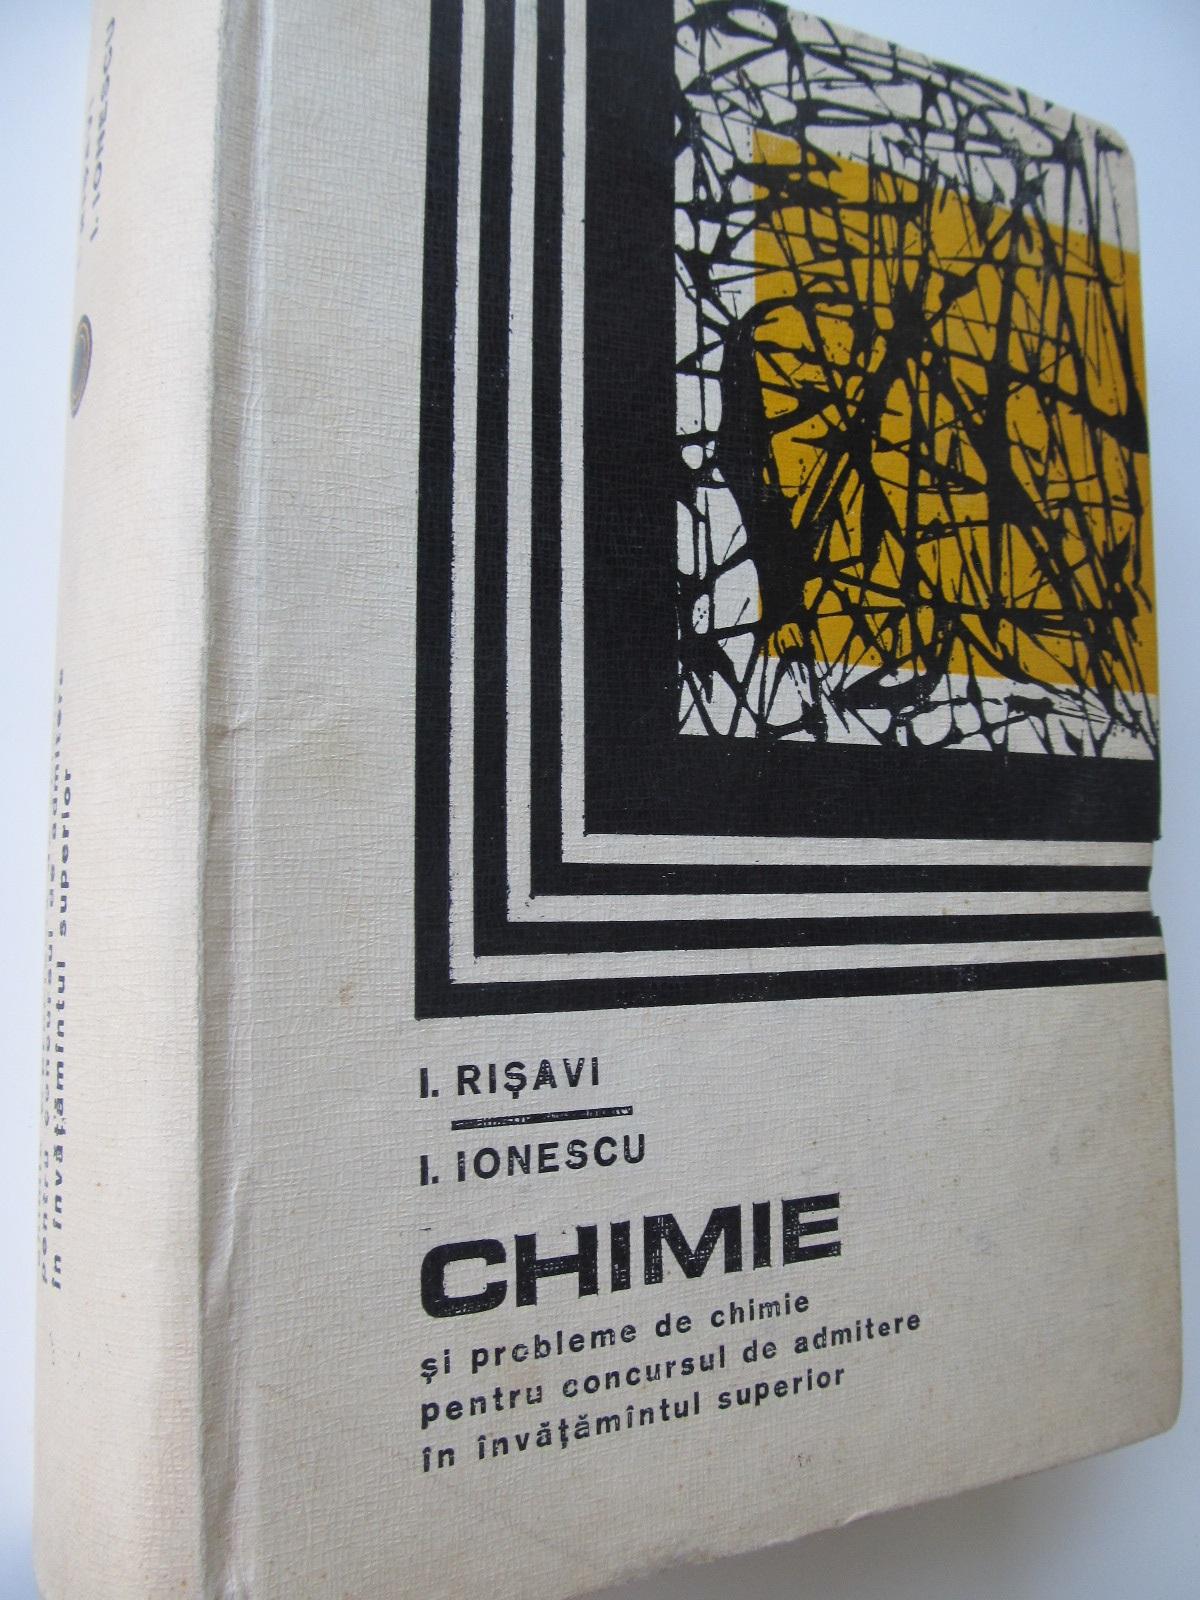 Chimie si probleme de chimie pentru concursul de admitere in invatamantul superior - I. Risavi , I. Ionescu | Detalii carte